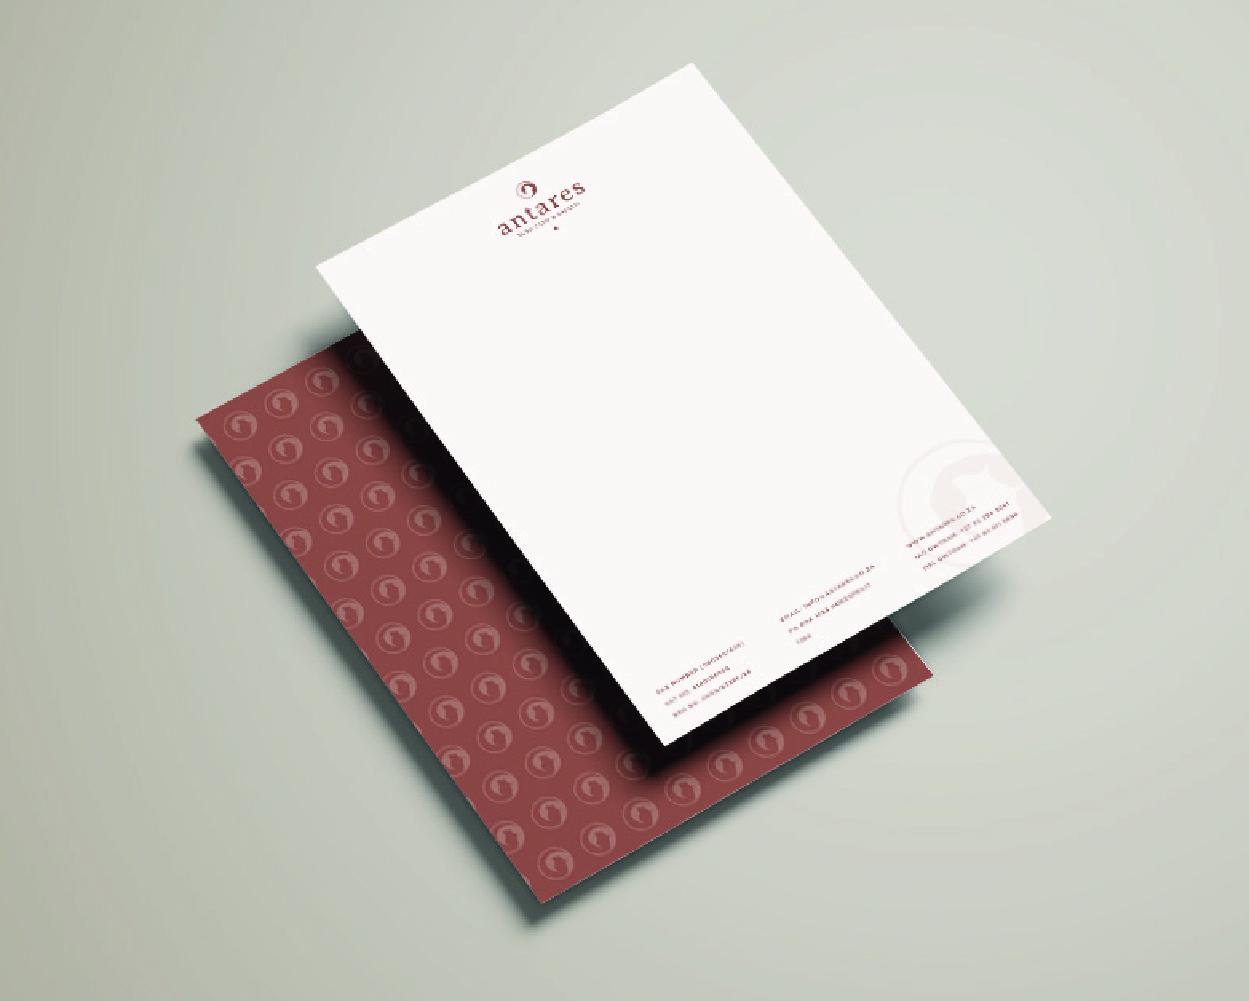 Antares_showcase-letterhead-08.jpg